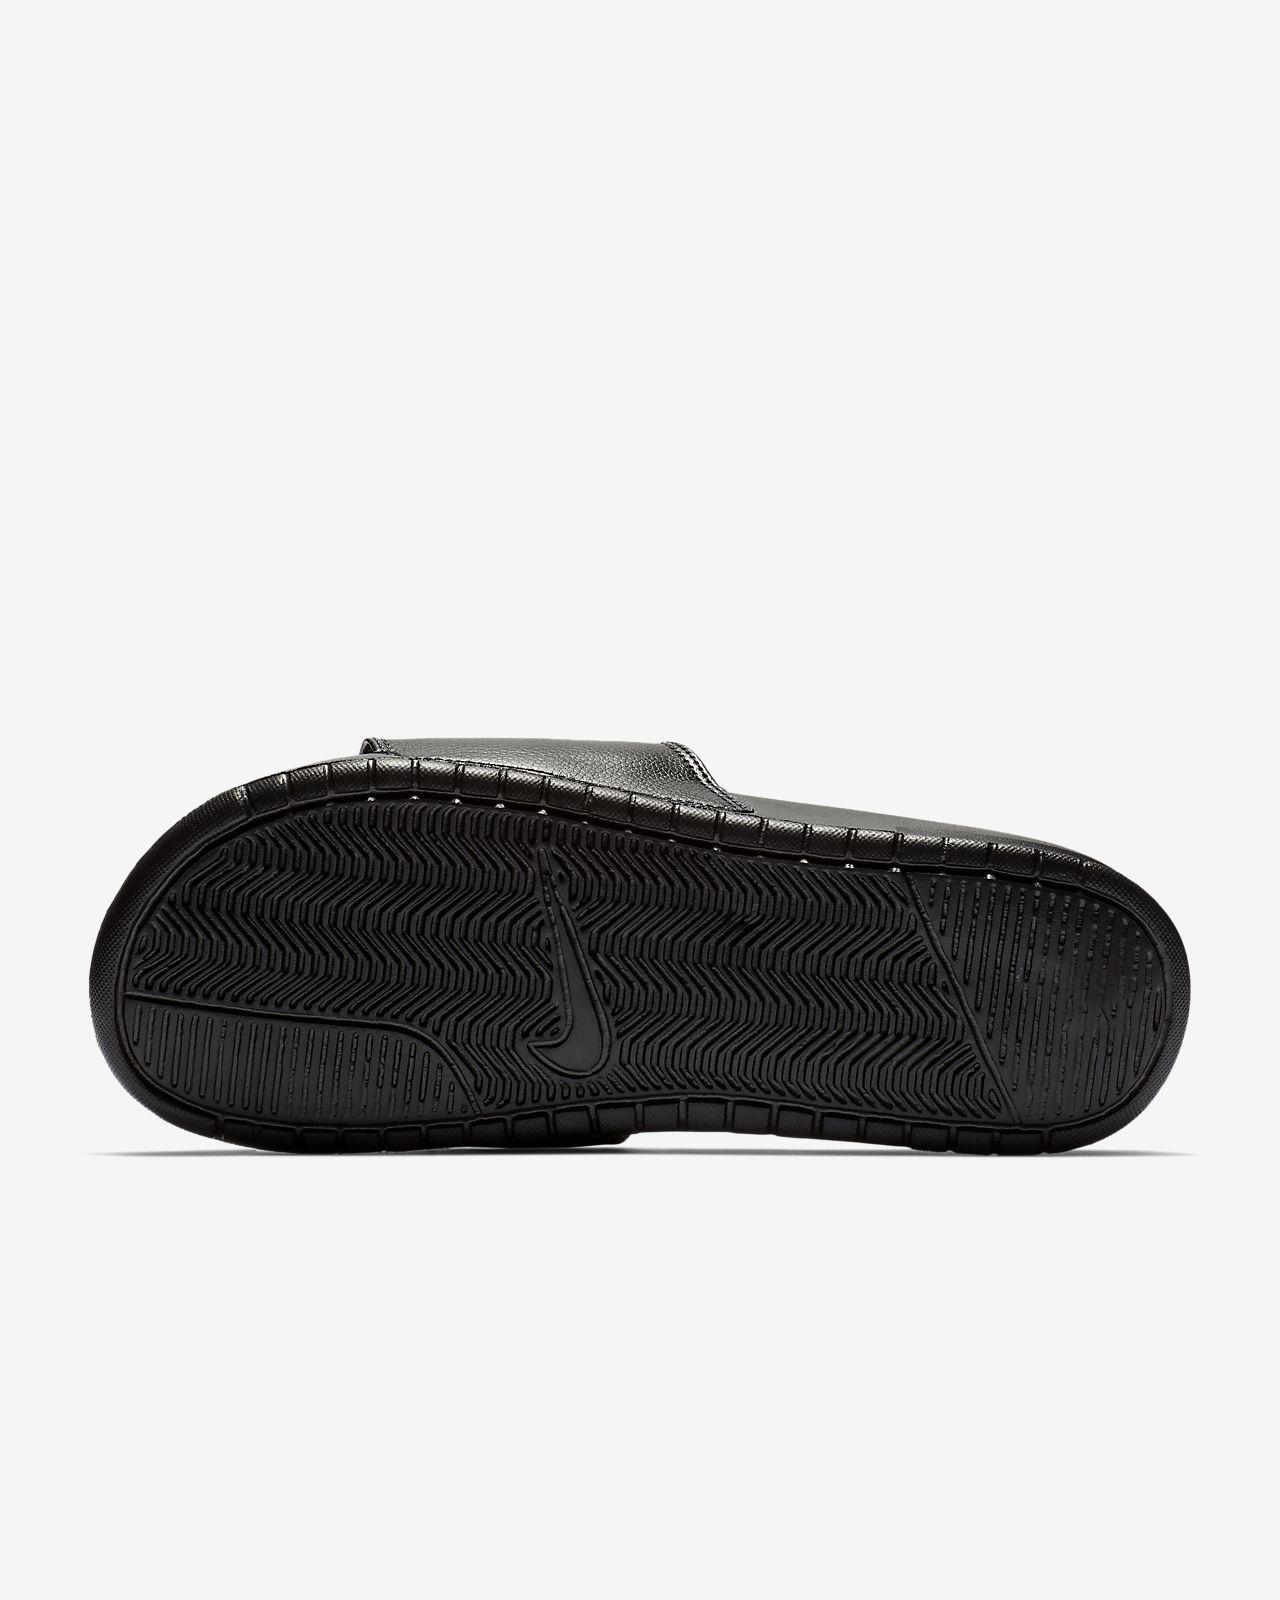 abf1b1e90 Low Resolution Nike Benassi Slide Nike Benassi Slide